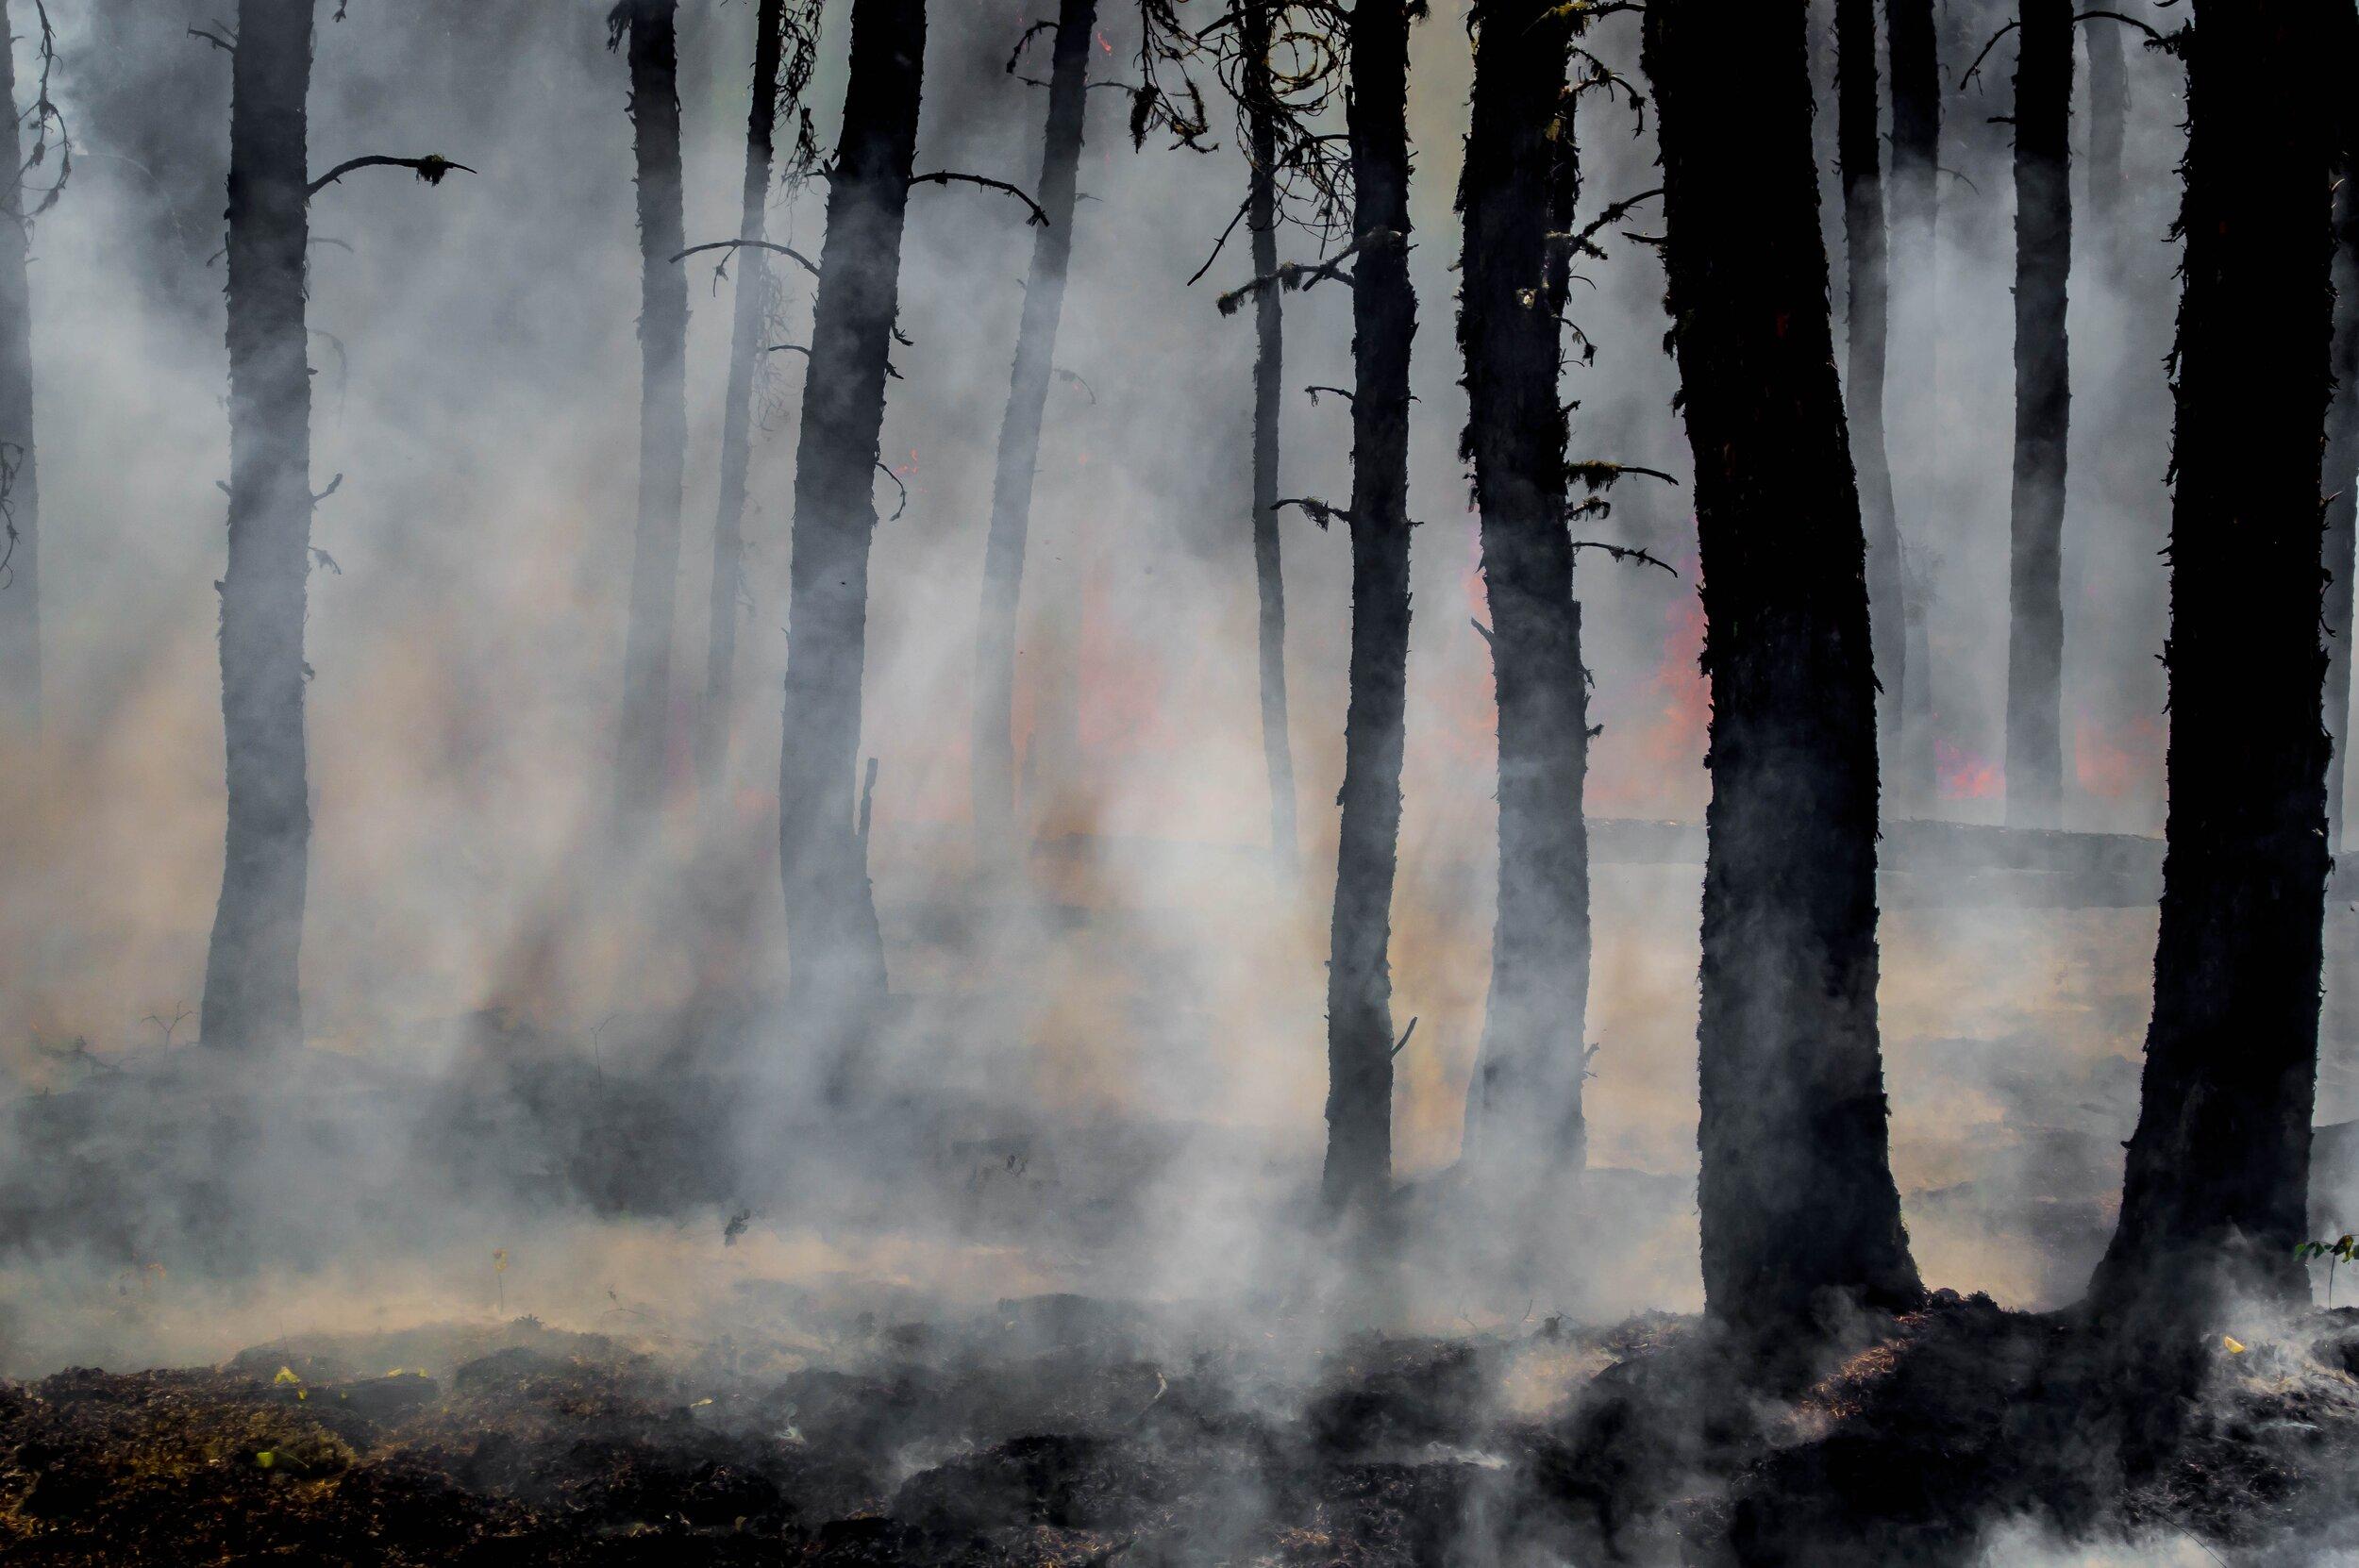 Threats to parks include fire. Photo: J. Francis via Unsplash.